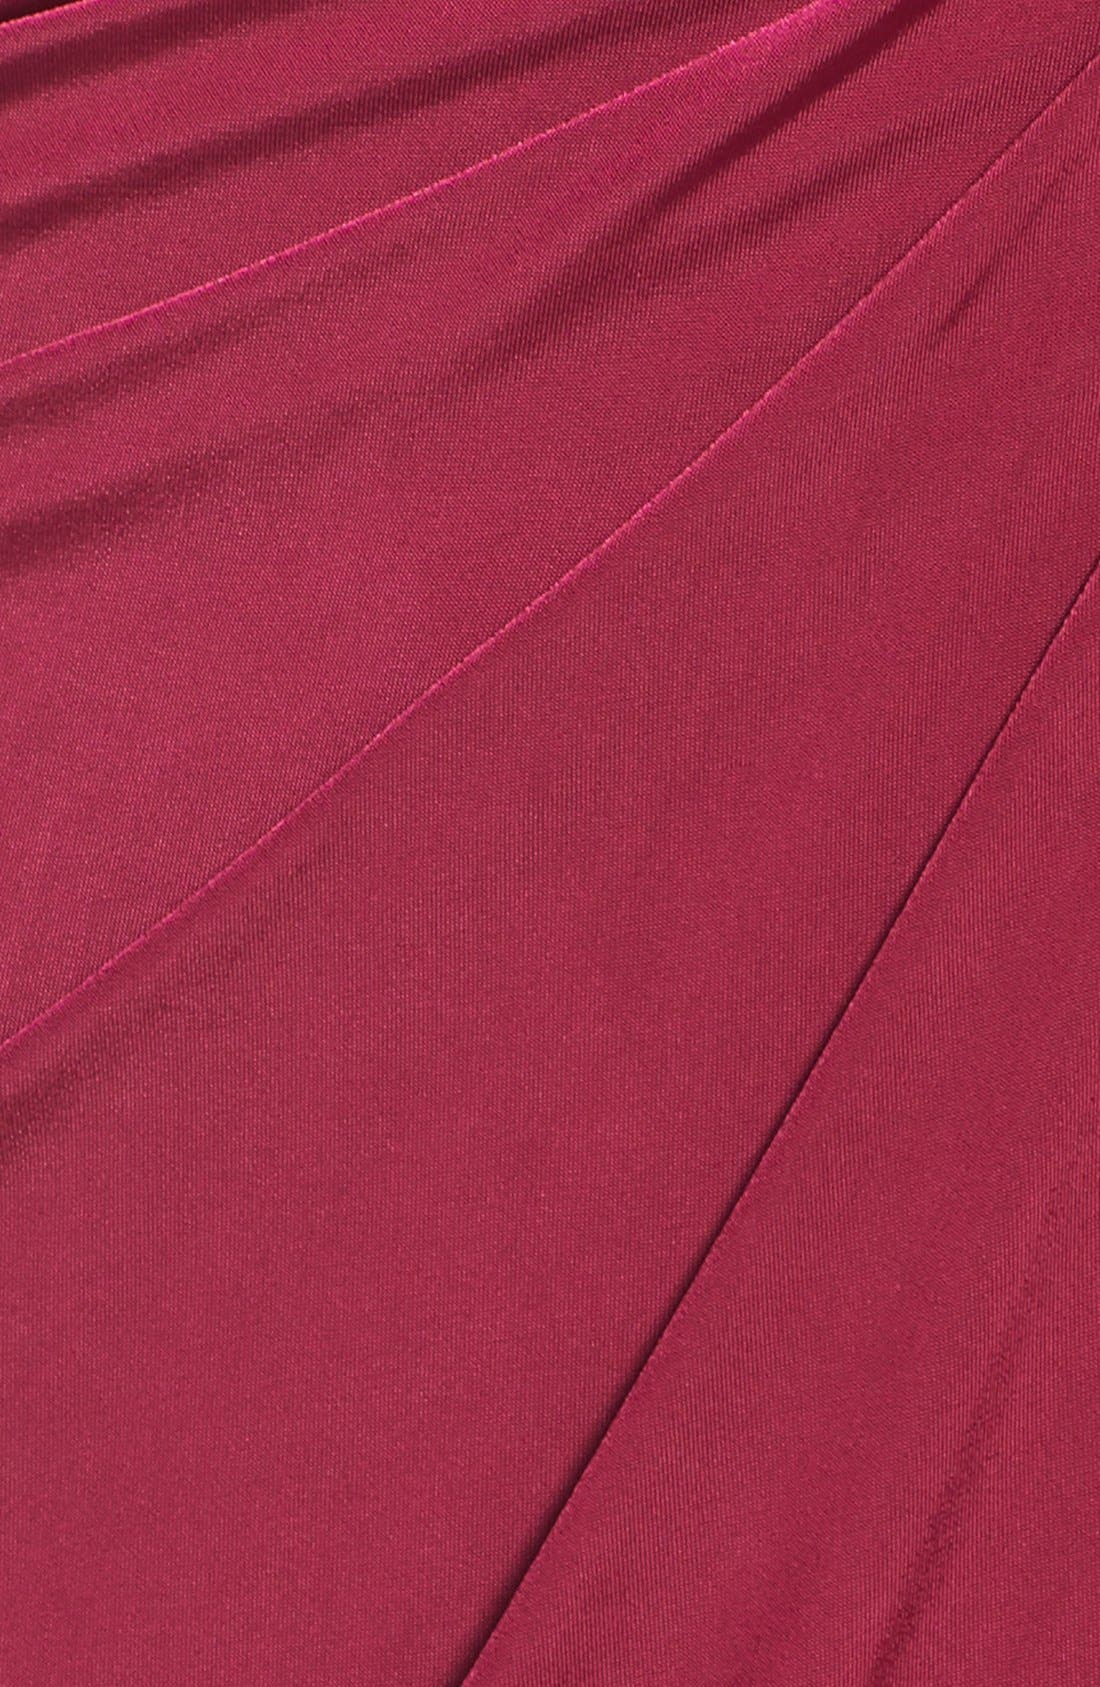 Jersey Halter Dress,                             Alternate thumbnail 6, color,                             935